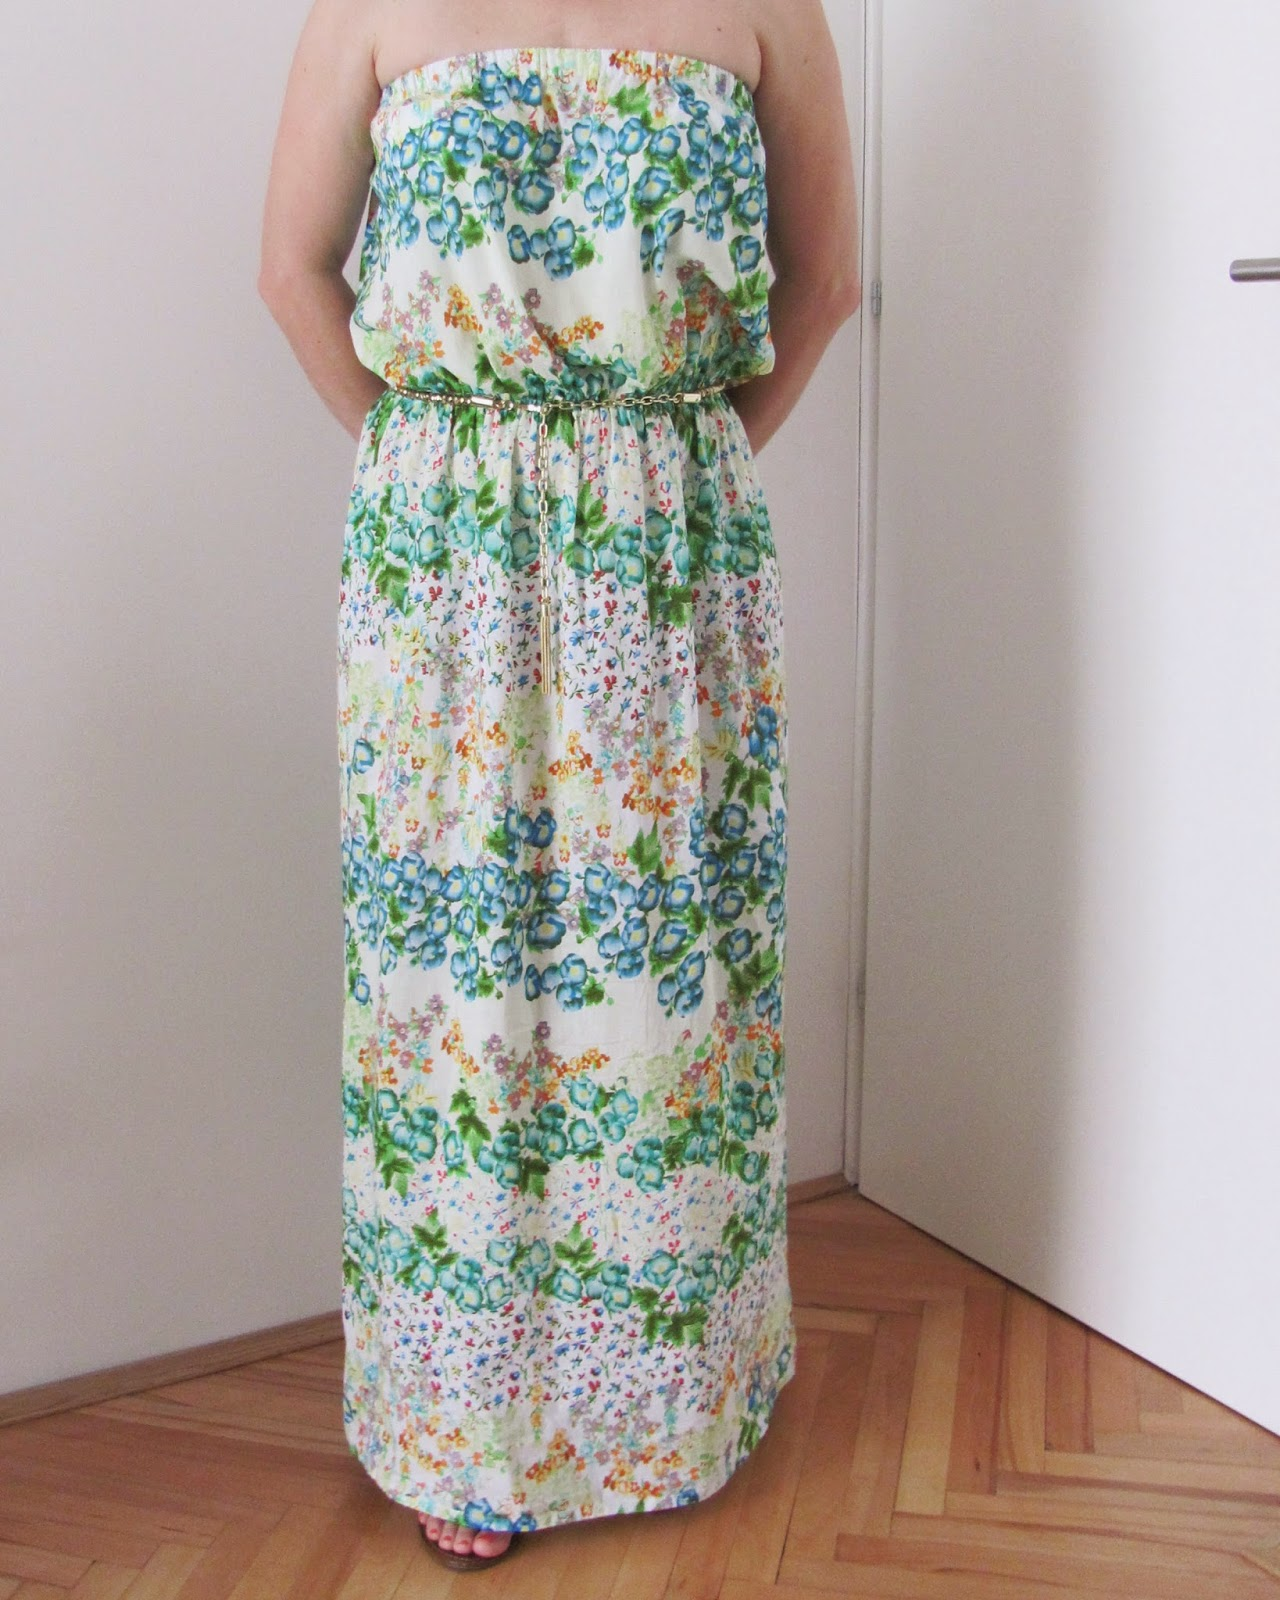 http://ladylinaland.blogspot.com/2013/09/maxi-floral-dress.html